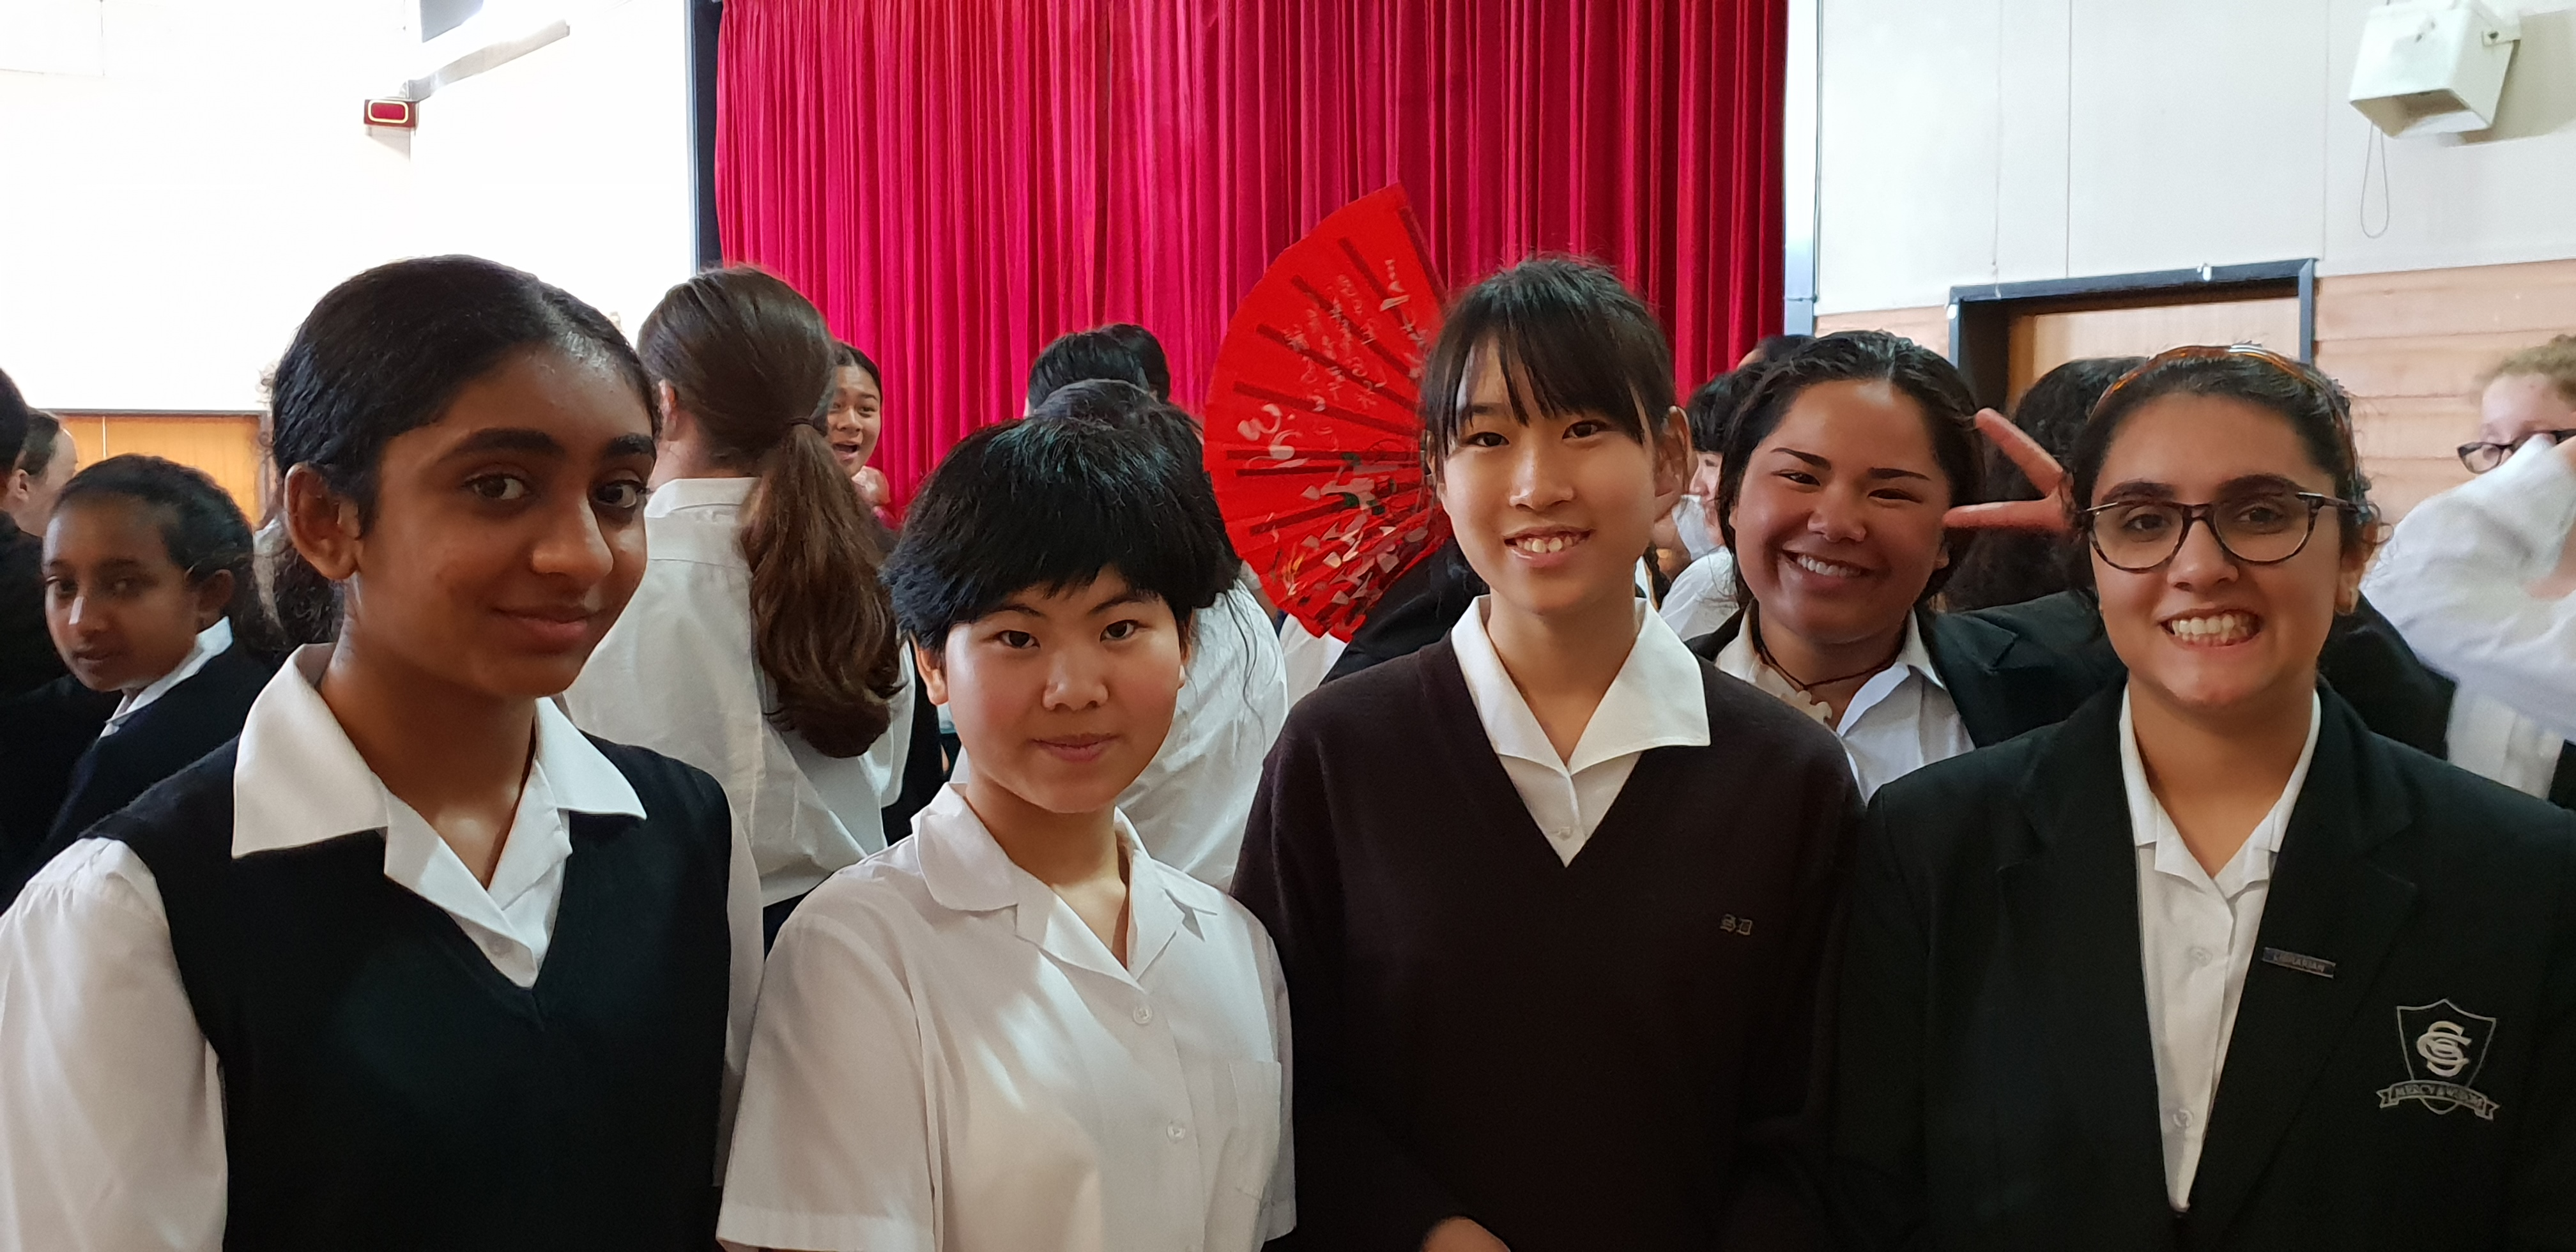 4 yuiko emi wt buddies